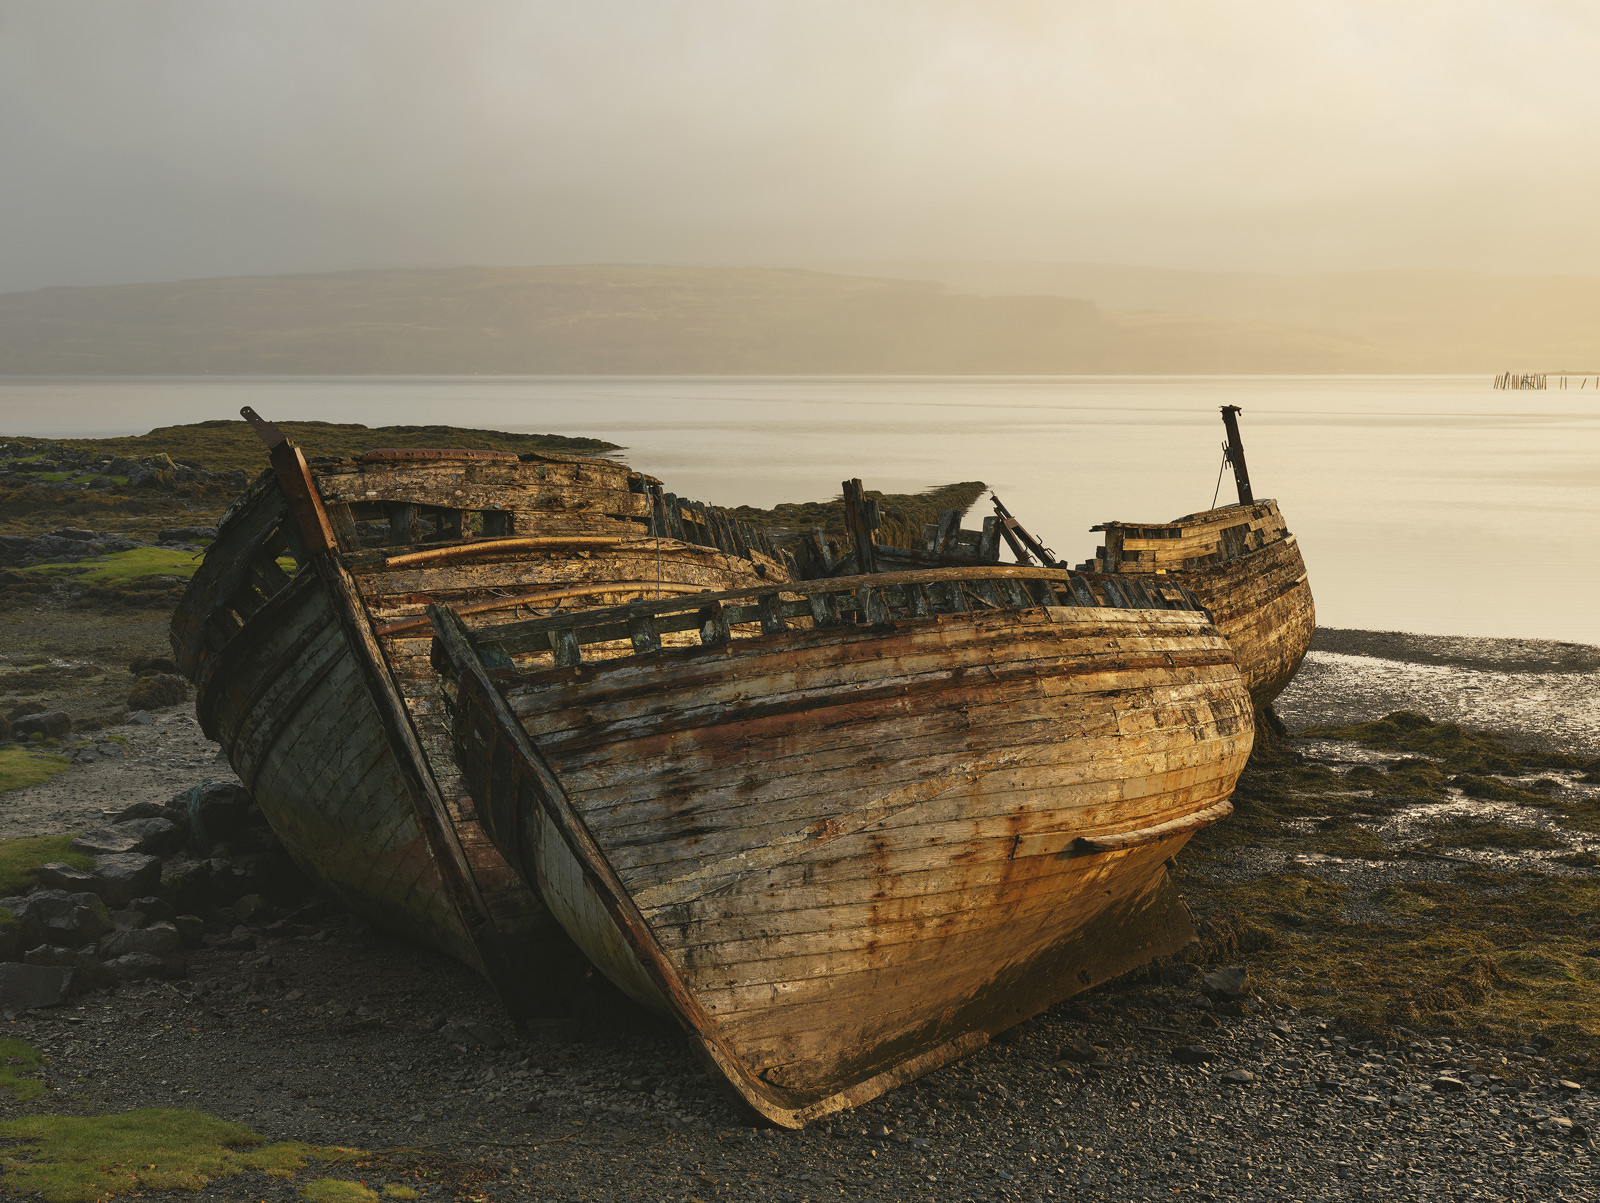 Monsoon and Sunshine Salen, Salen, Mull, Scotland squally, backlit, shower, soaked, rain, sunlight, wrecked, boats, old, photo